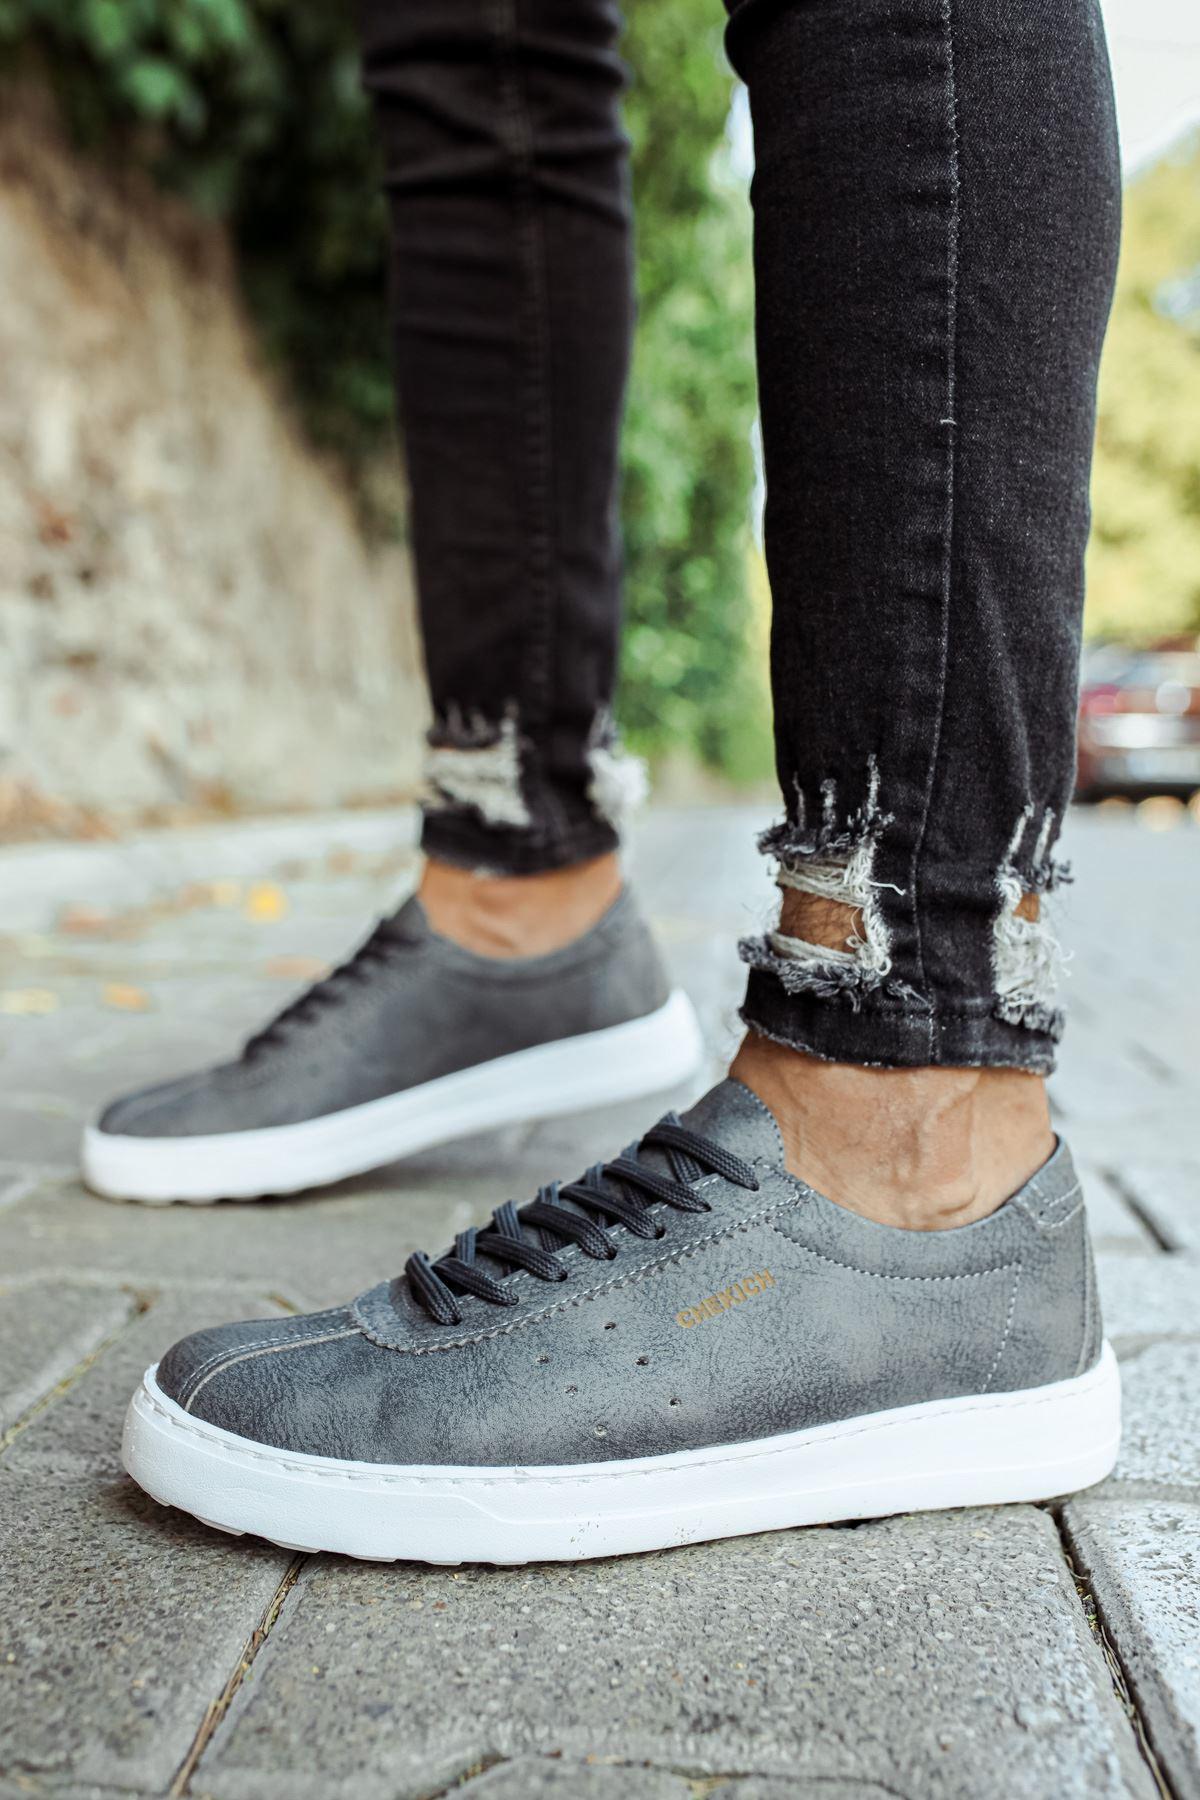 Chekich CH063 BT Erkek Ayakkabı ANTRASIT